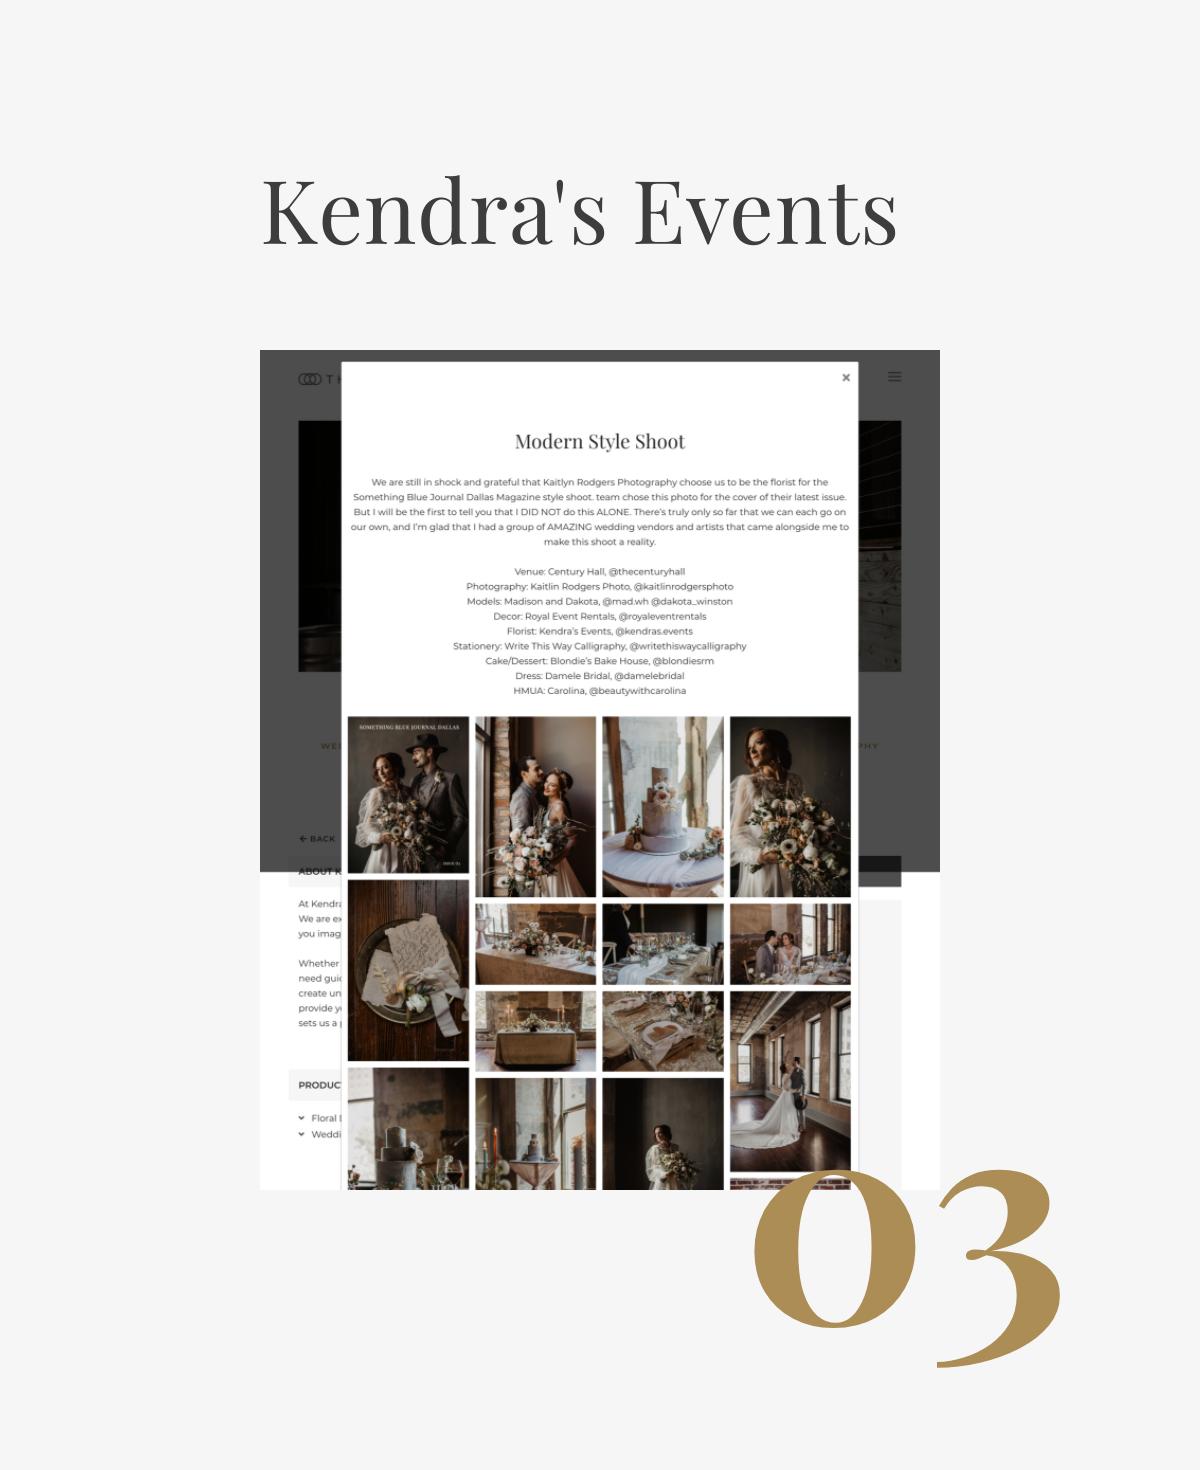 Kendra's Events